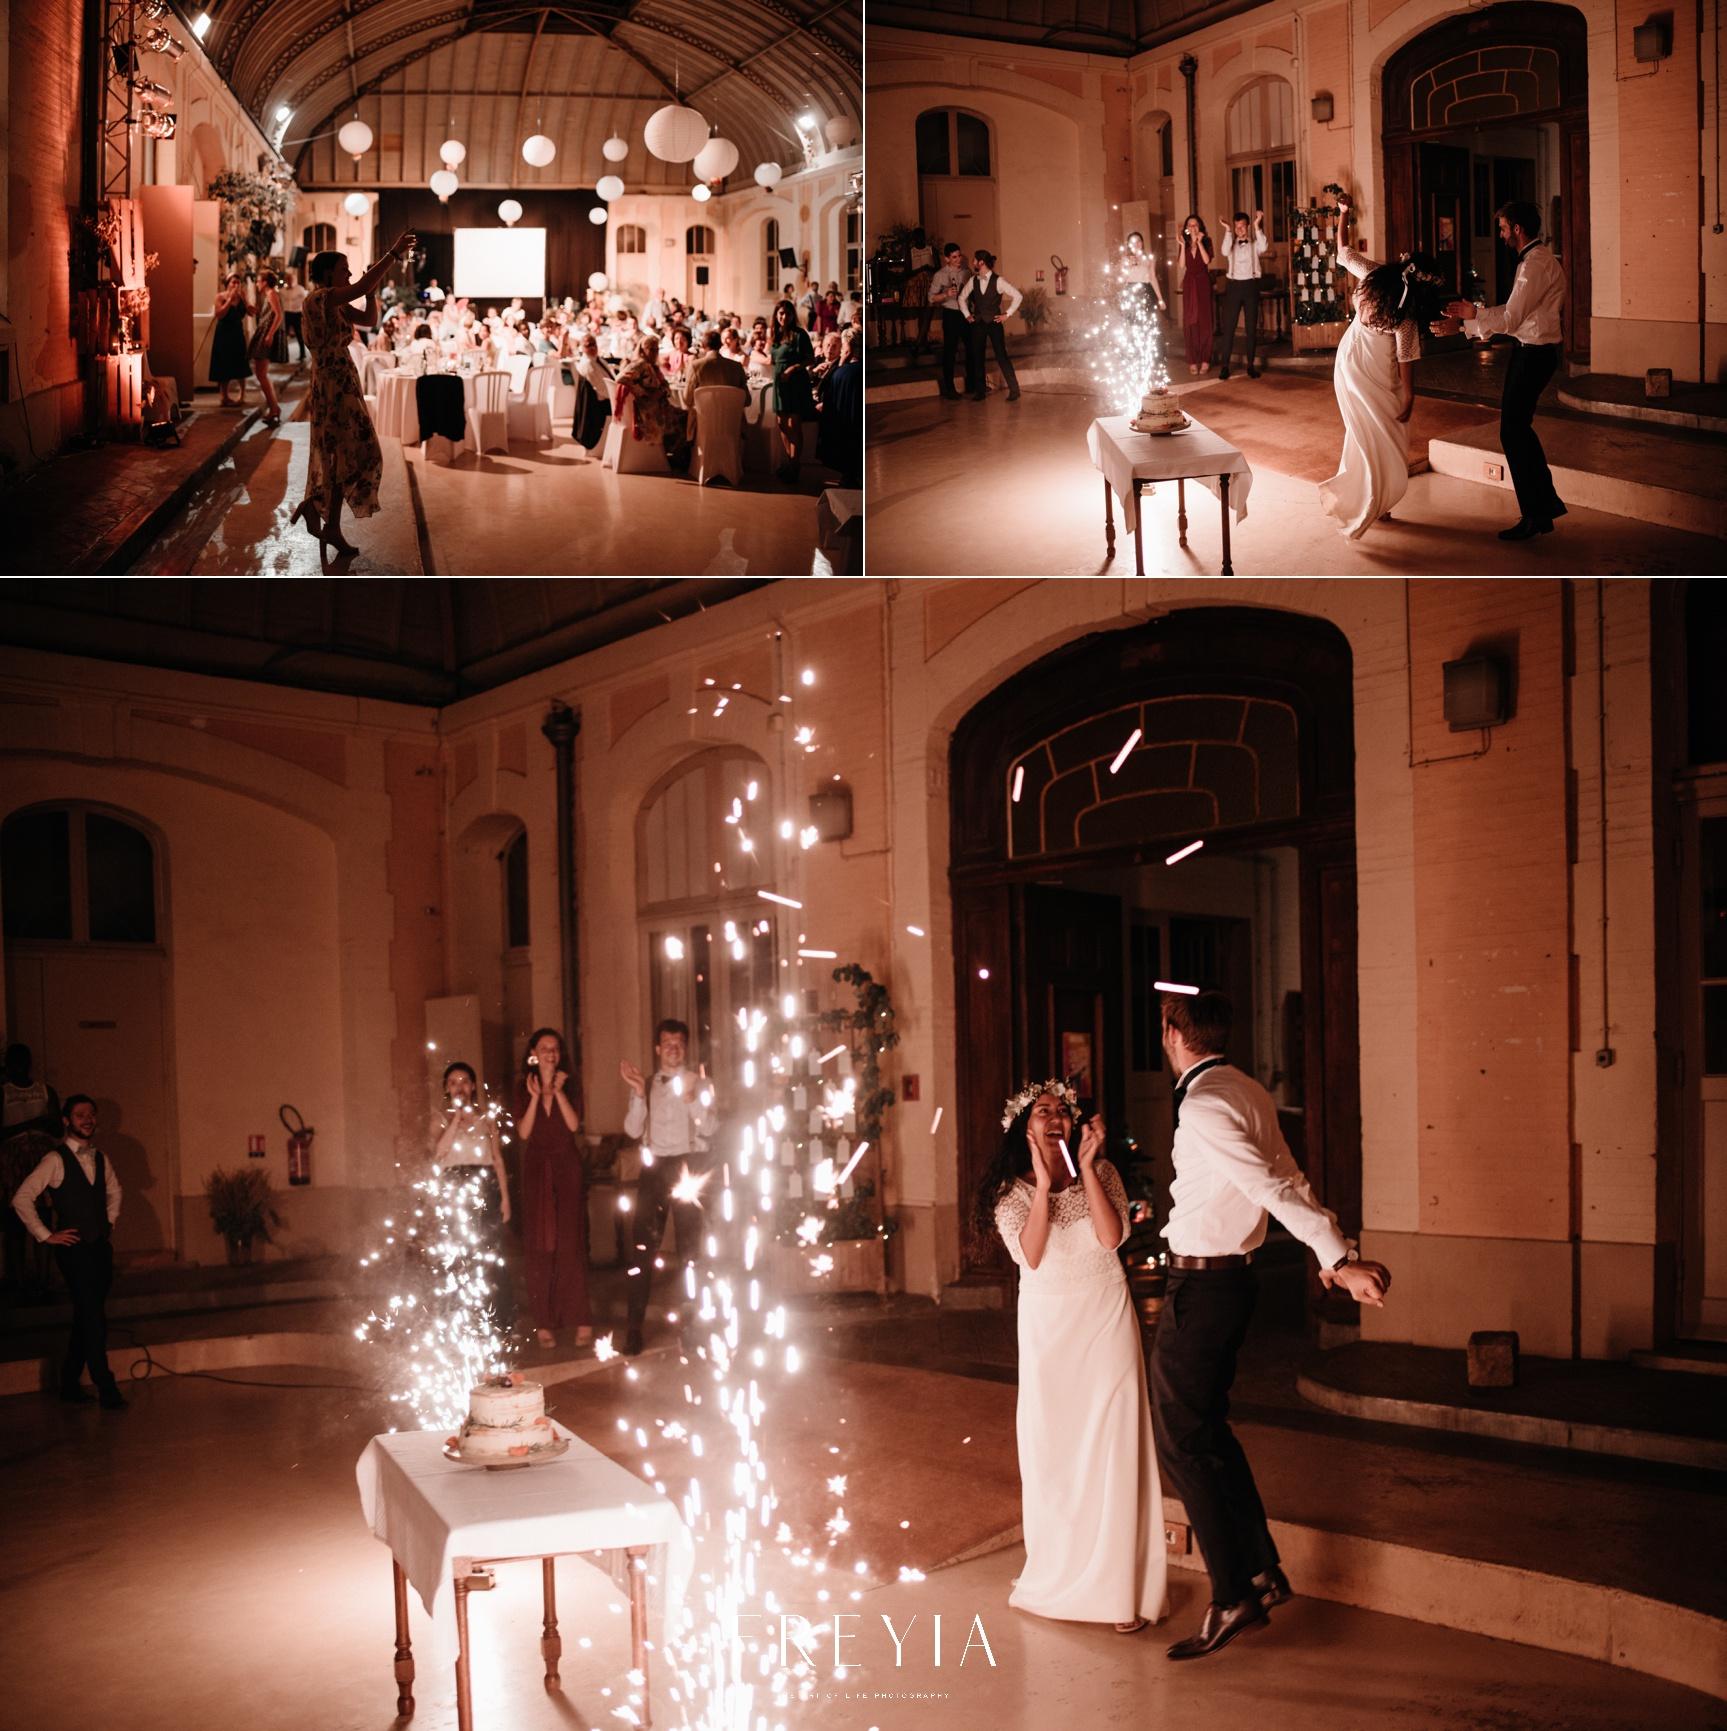 R + T |  mariage reportage alternatif moody intime minimaliste vintage naturel boho boheme |  PHOTOGRAPHE mariage PARIS france destination  | FREYIA photography_-356.jpg